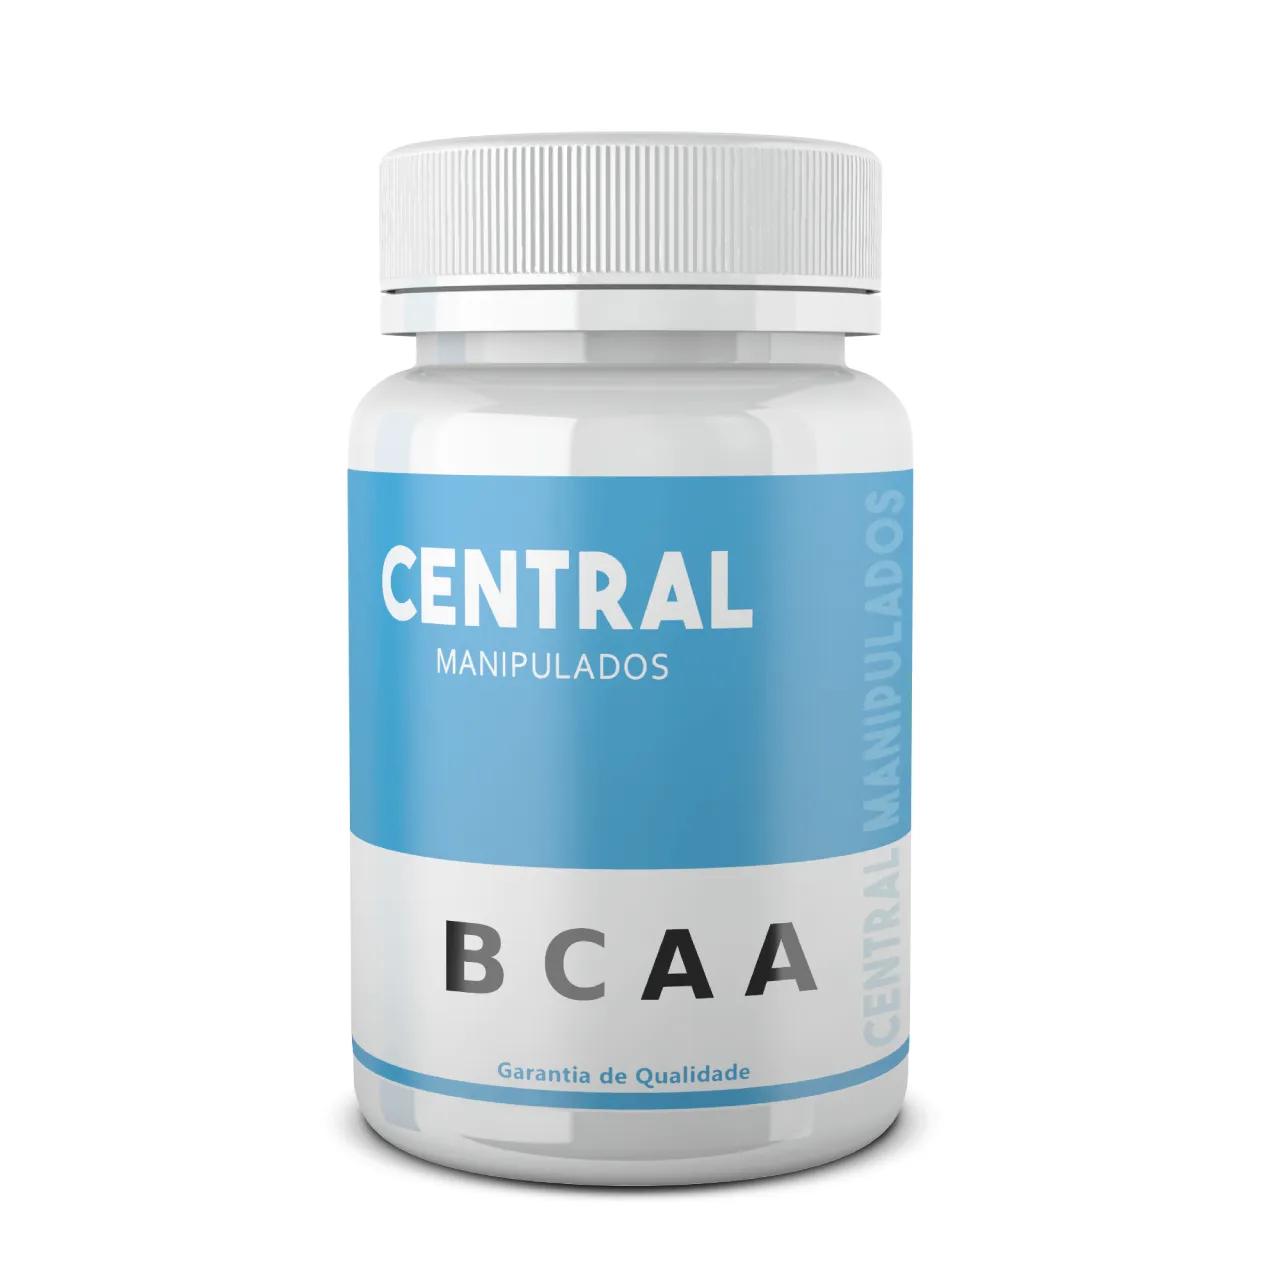 BCAA 600mg - 60 cápsulas - Ganho de Massa Muscular